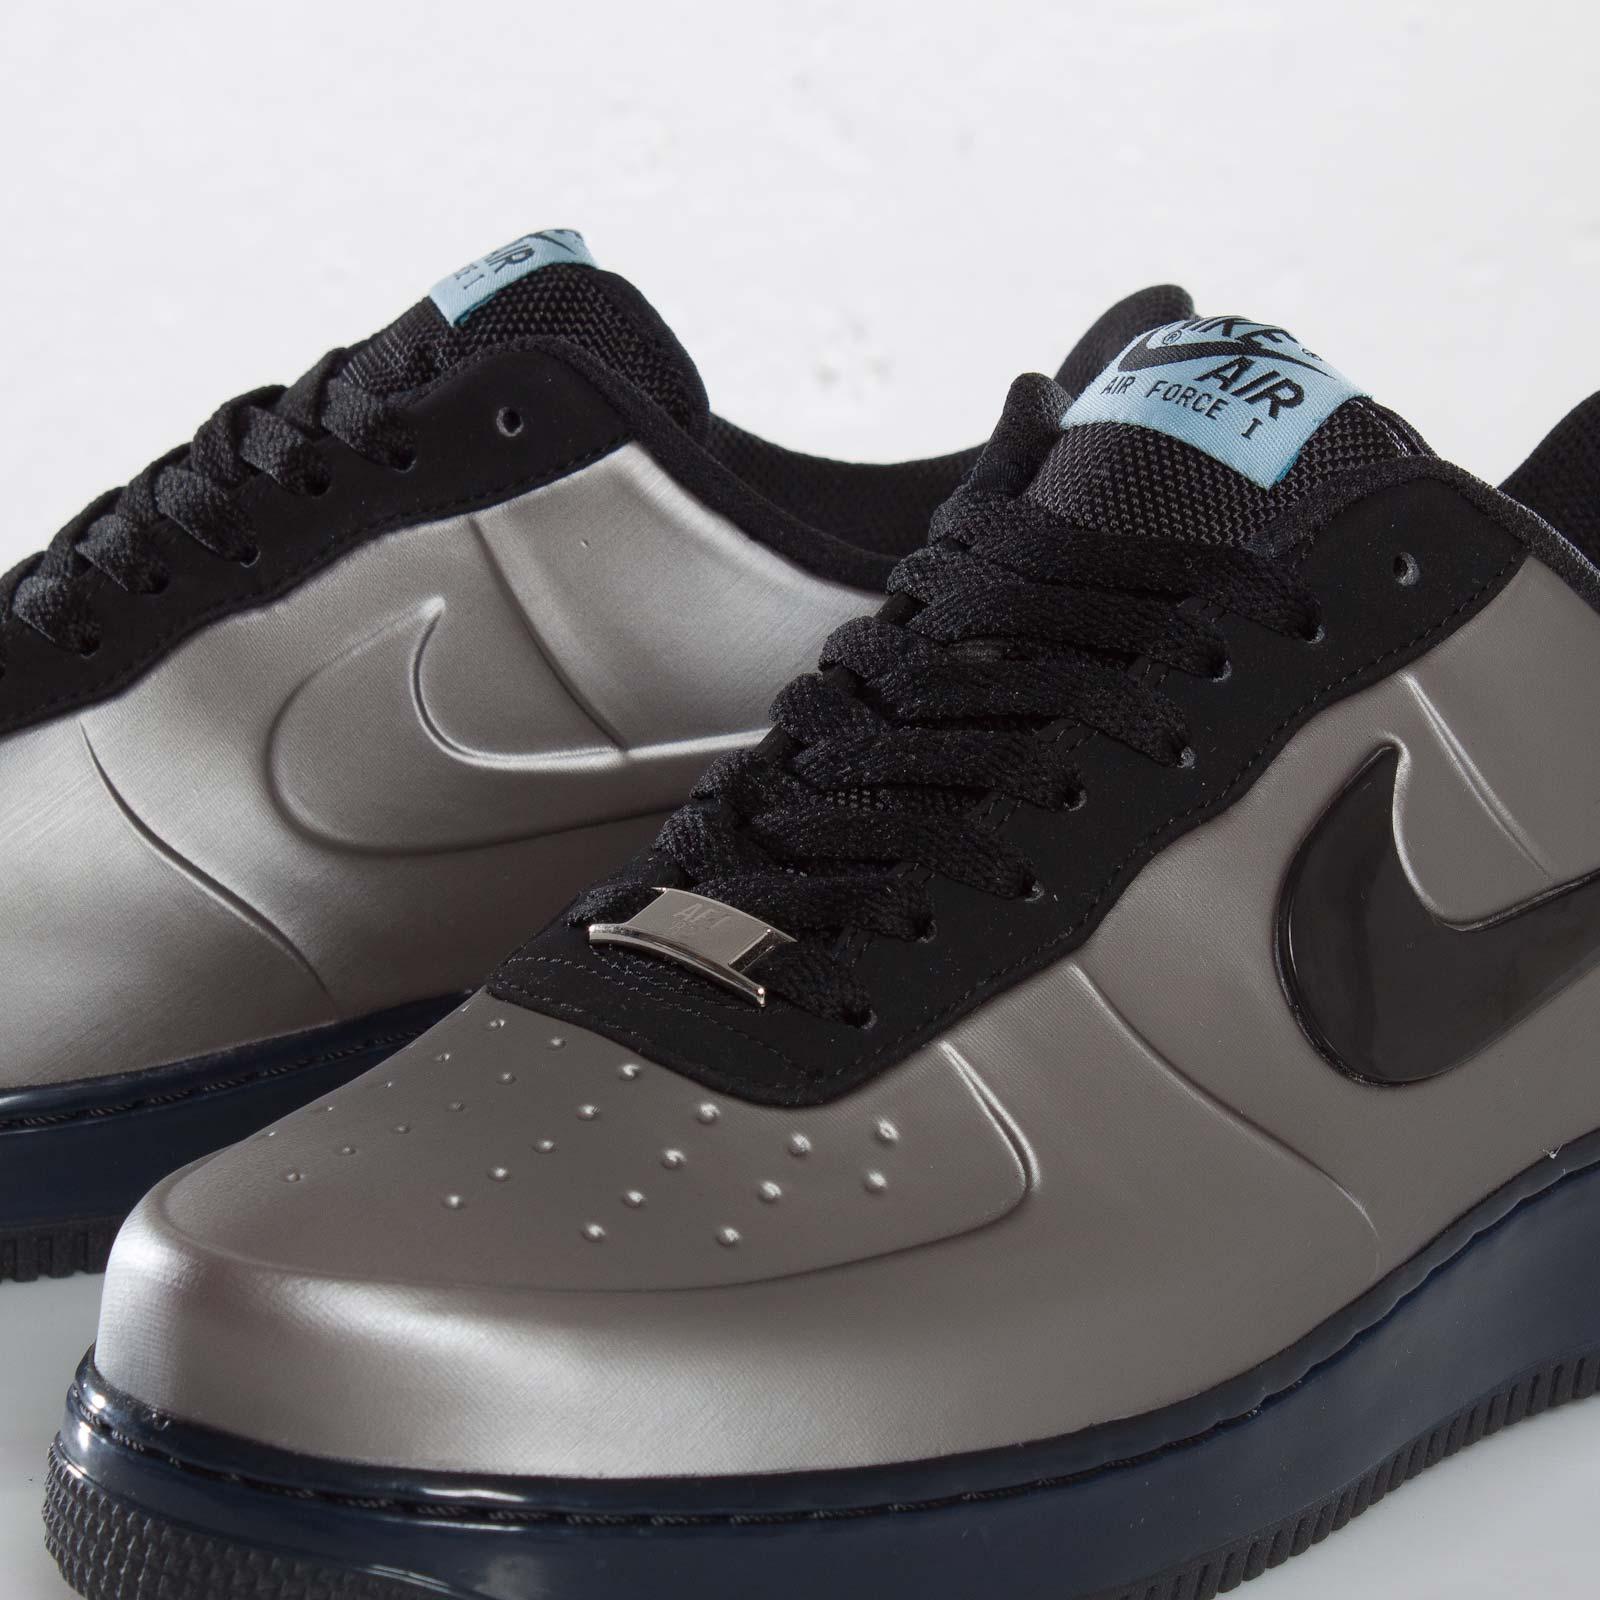 free shipping 8da2a 8120d Nike Air Force 1 Foamposite Pro Low - 532461-001 ...